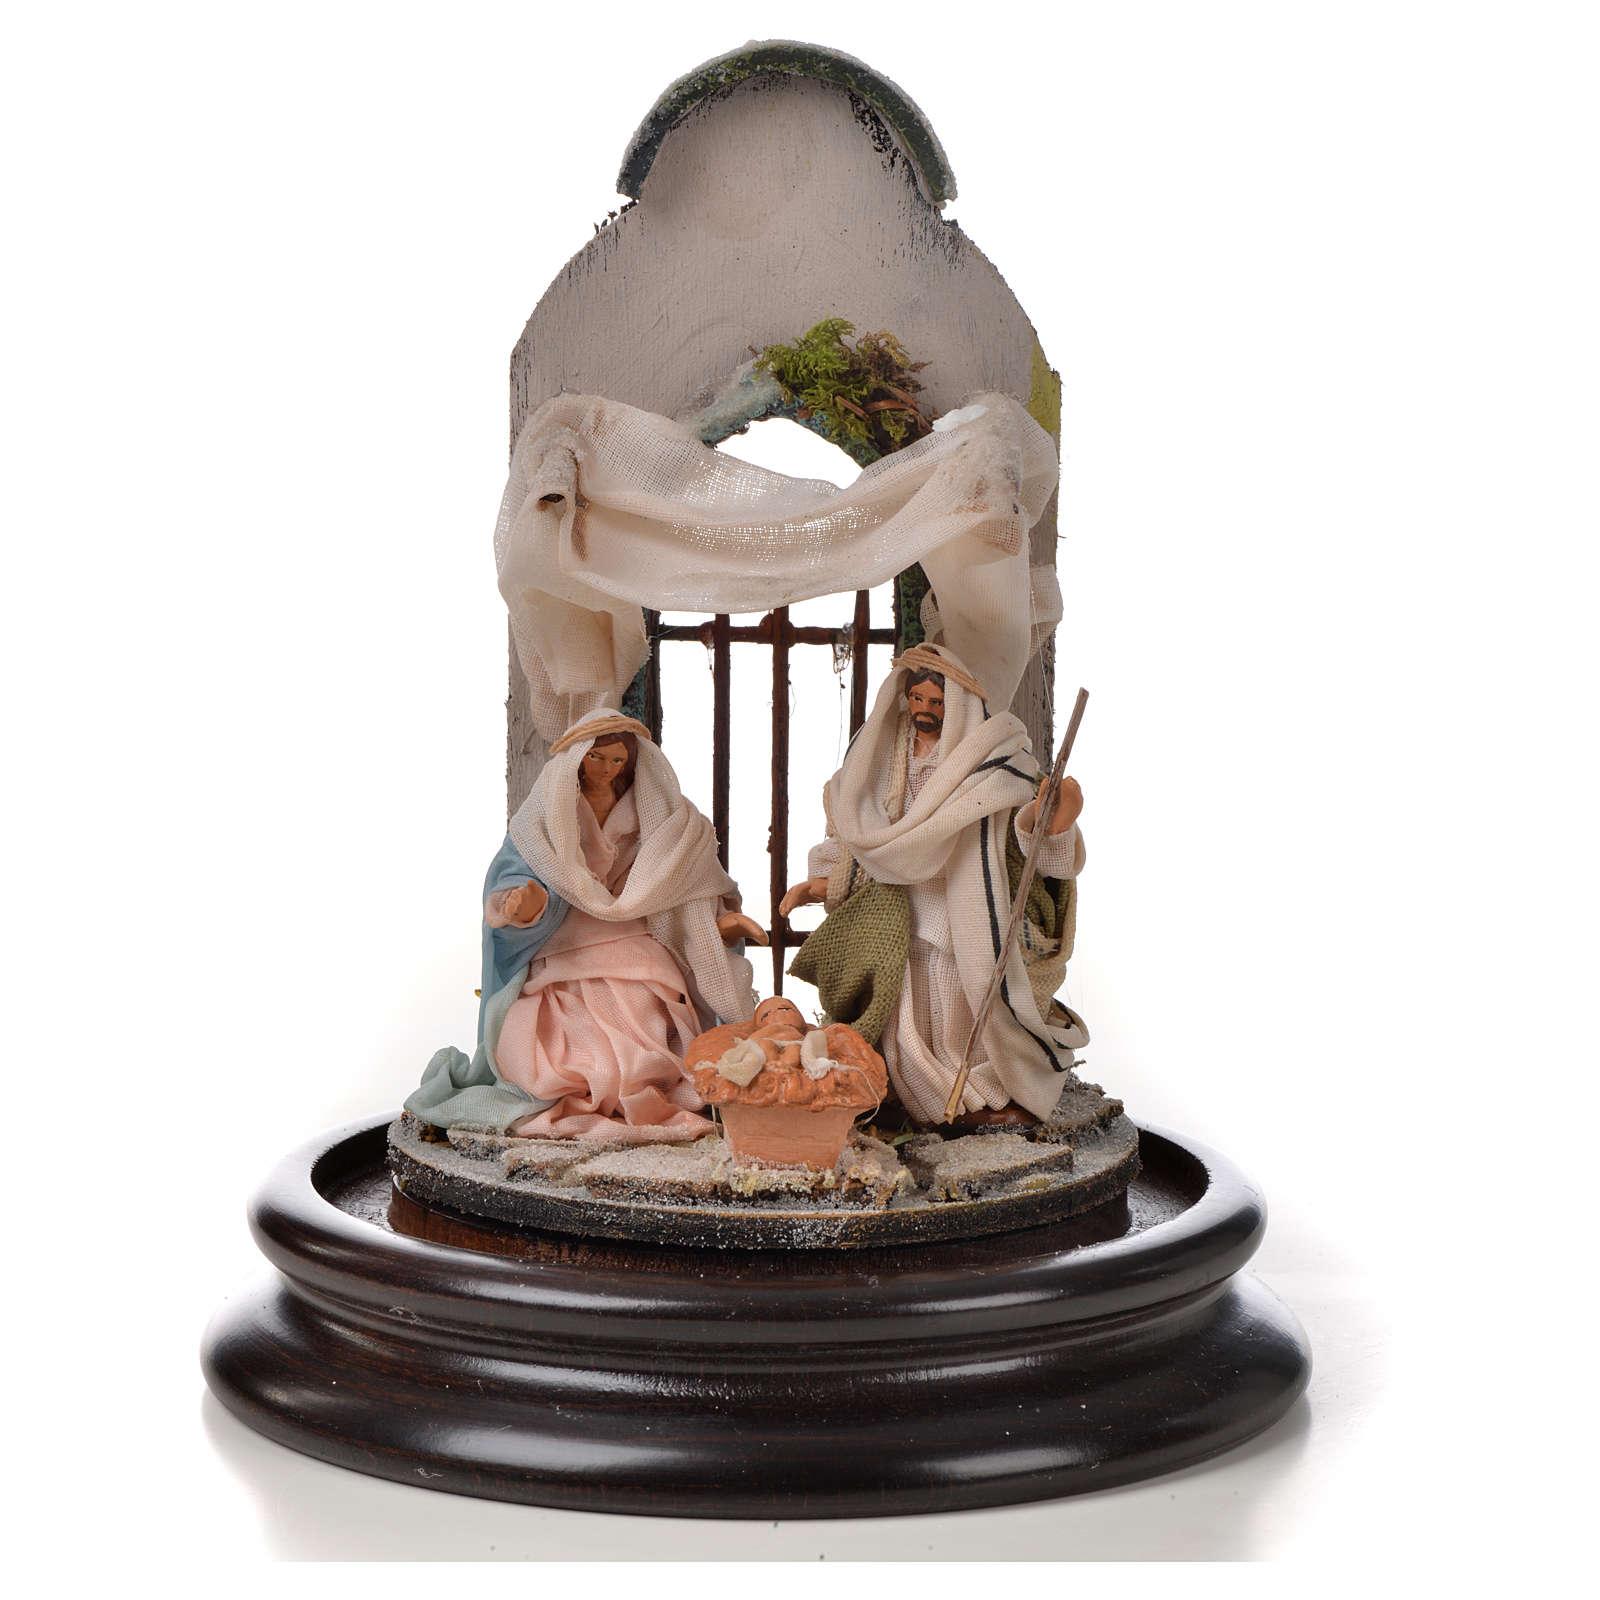 Natività Napoli terracotta stile arabo 11X16 cm campana di vetr 4